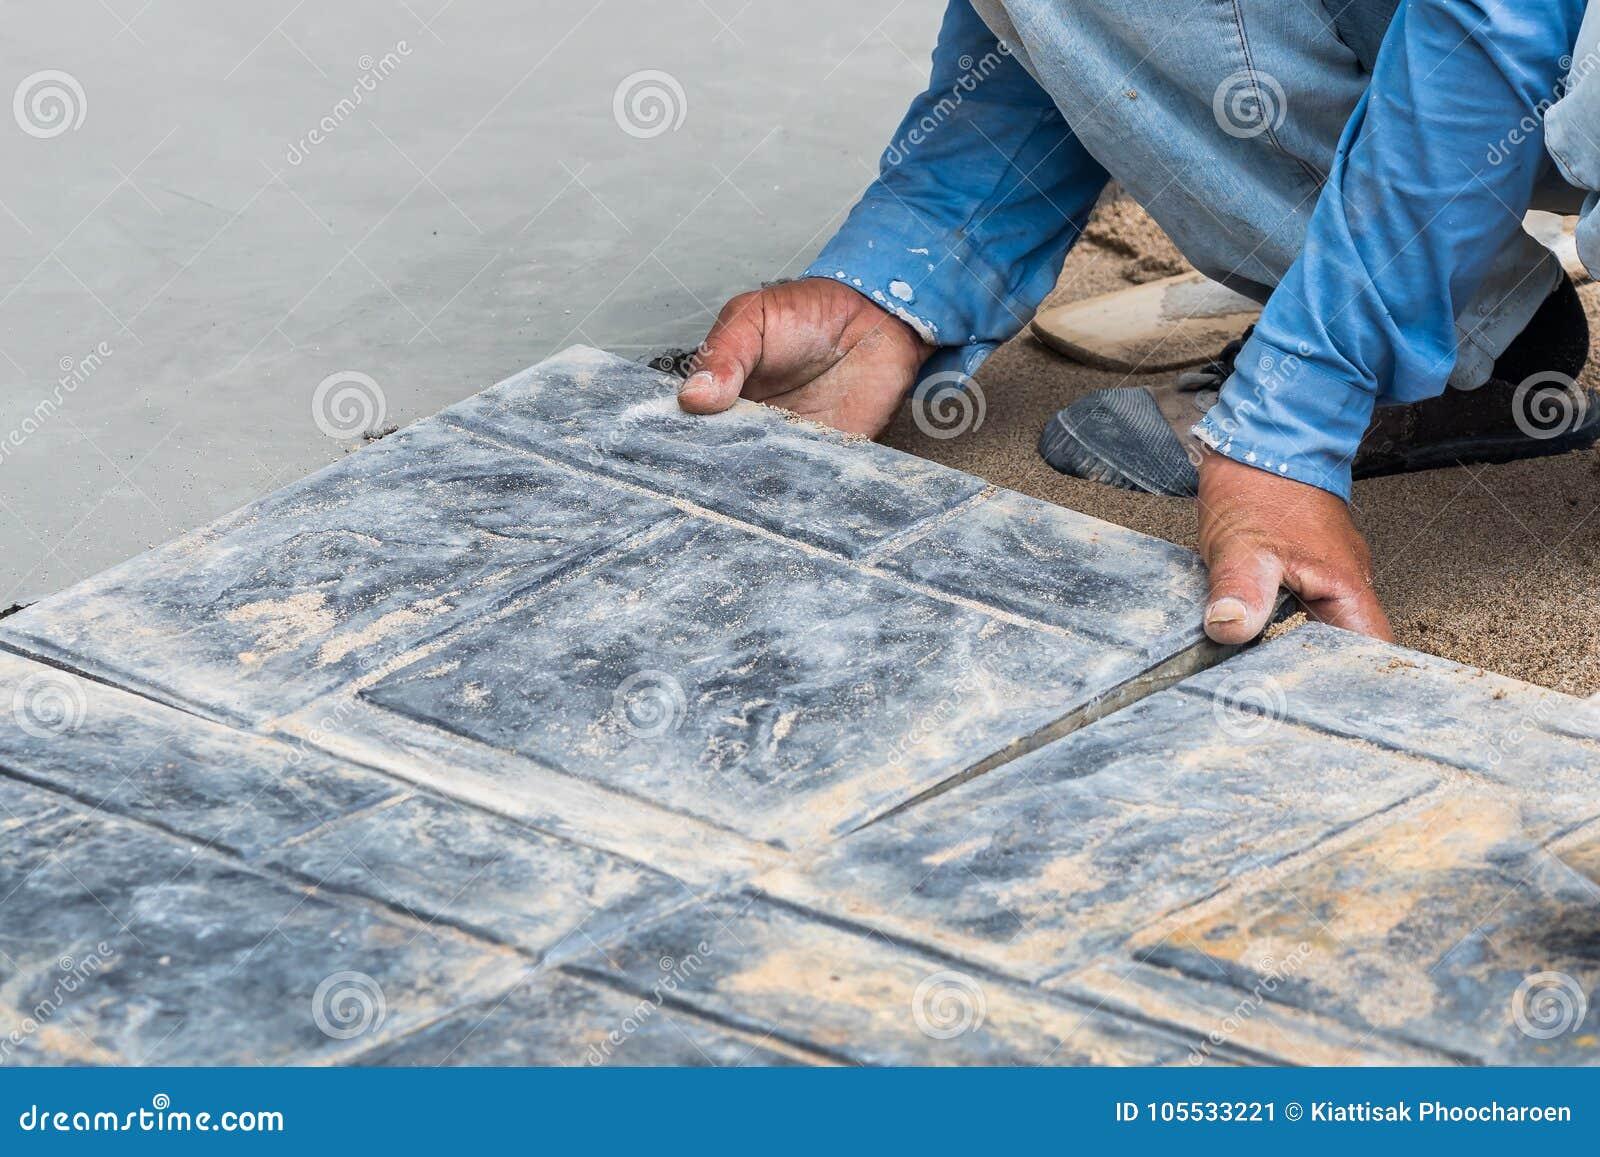 Installing Tiles Floor In Construction Work Stock Image - Image of ...